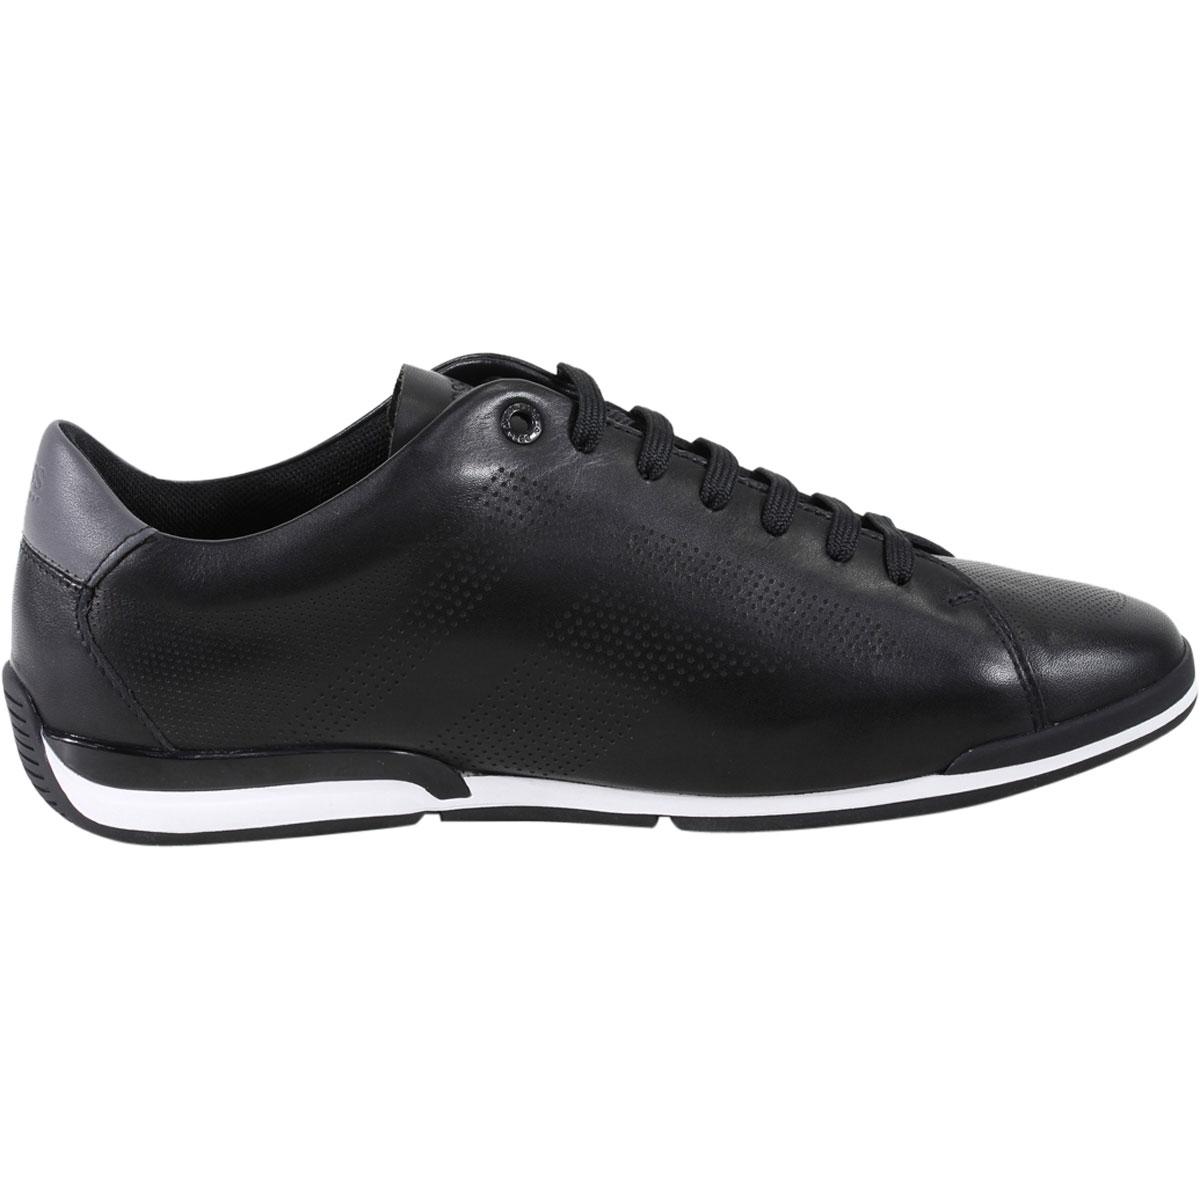 Hugo Boss Para Para Para Hombre Saturn Zapatillas zapatillas zapatos de espuma de memoria 61eae8